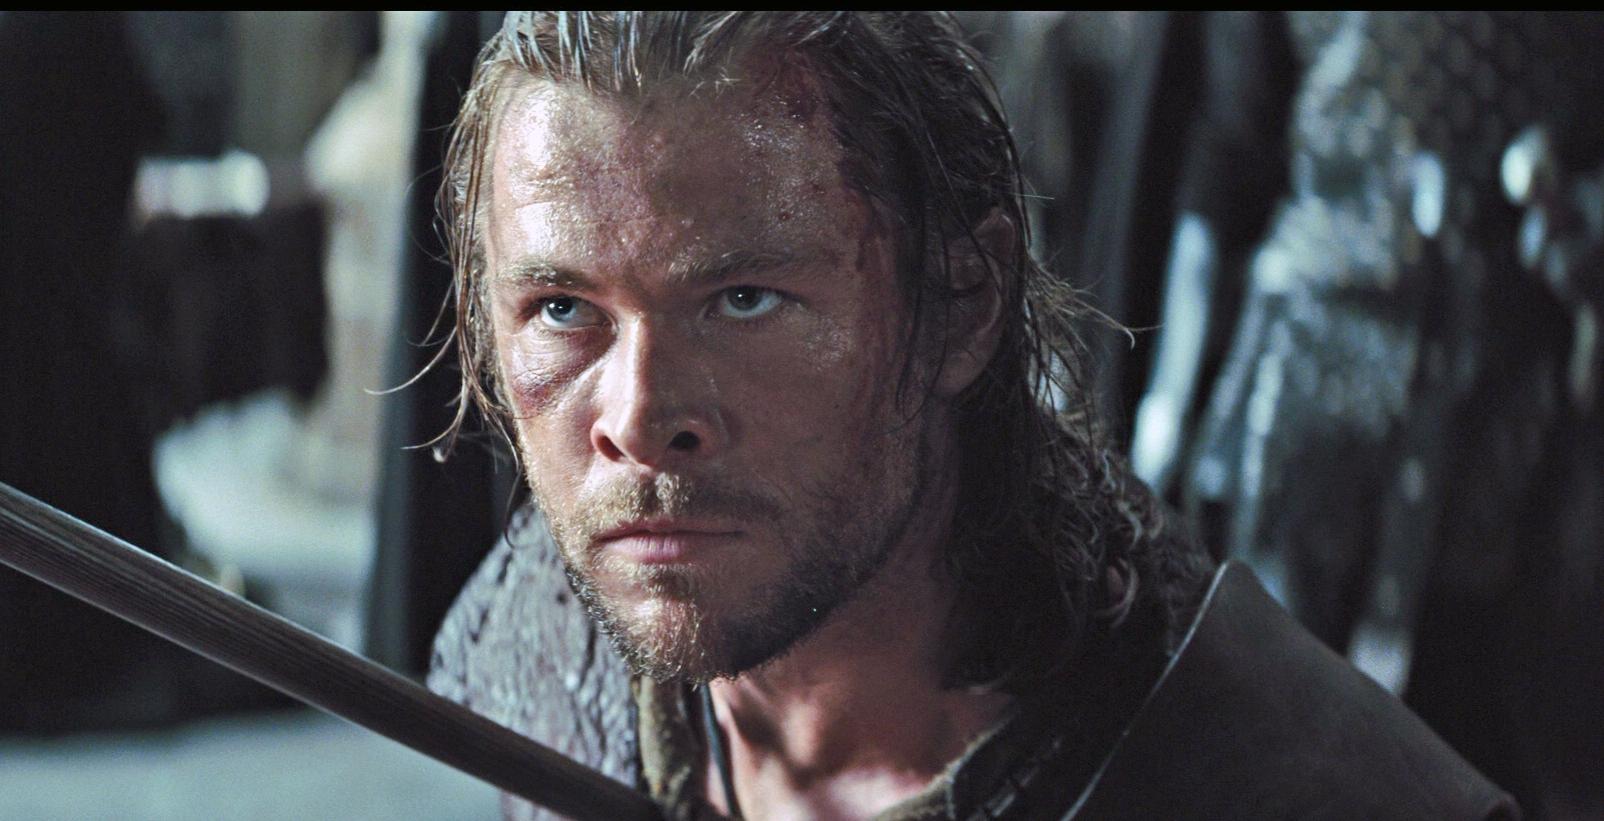 Chris Hemsworth Snow White and the Huntsman2